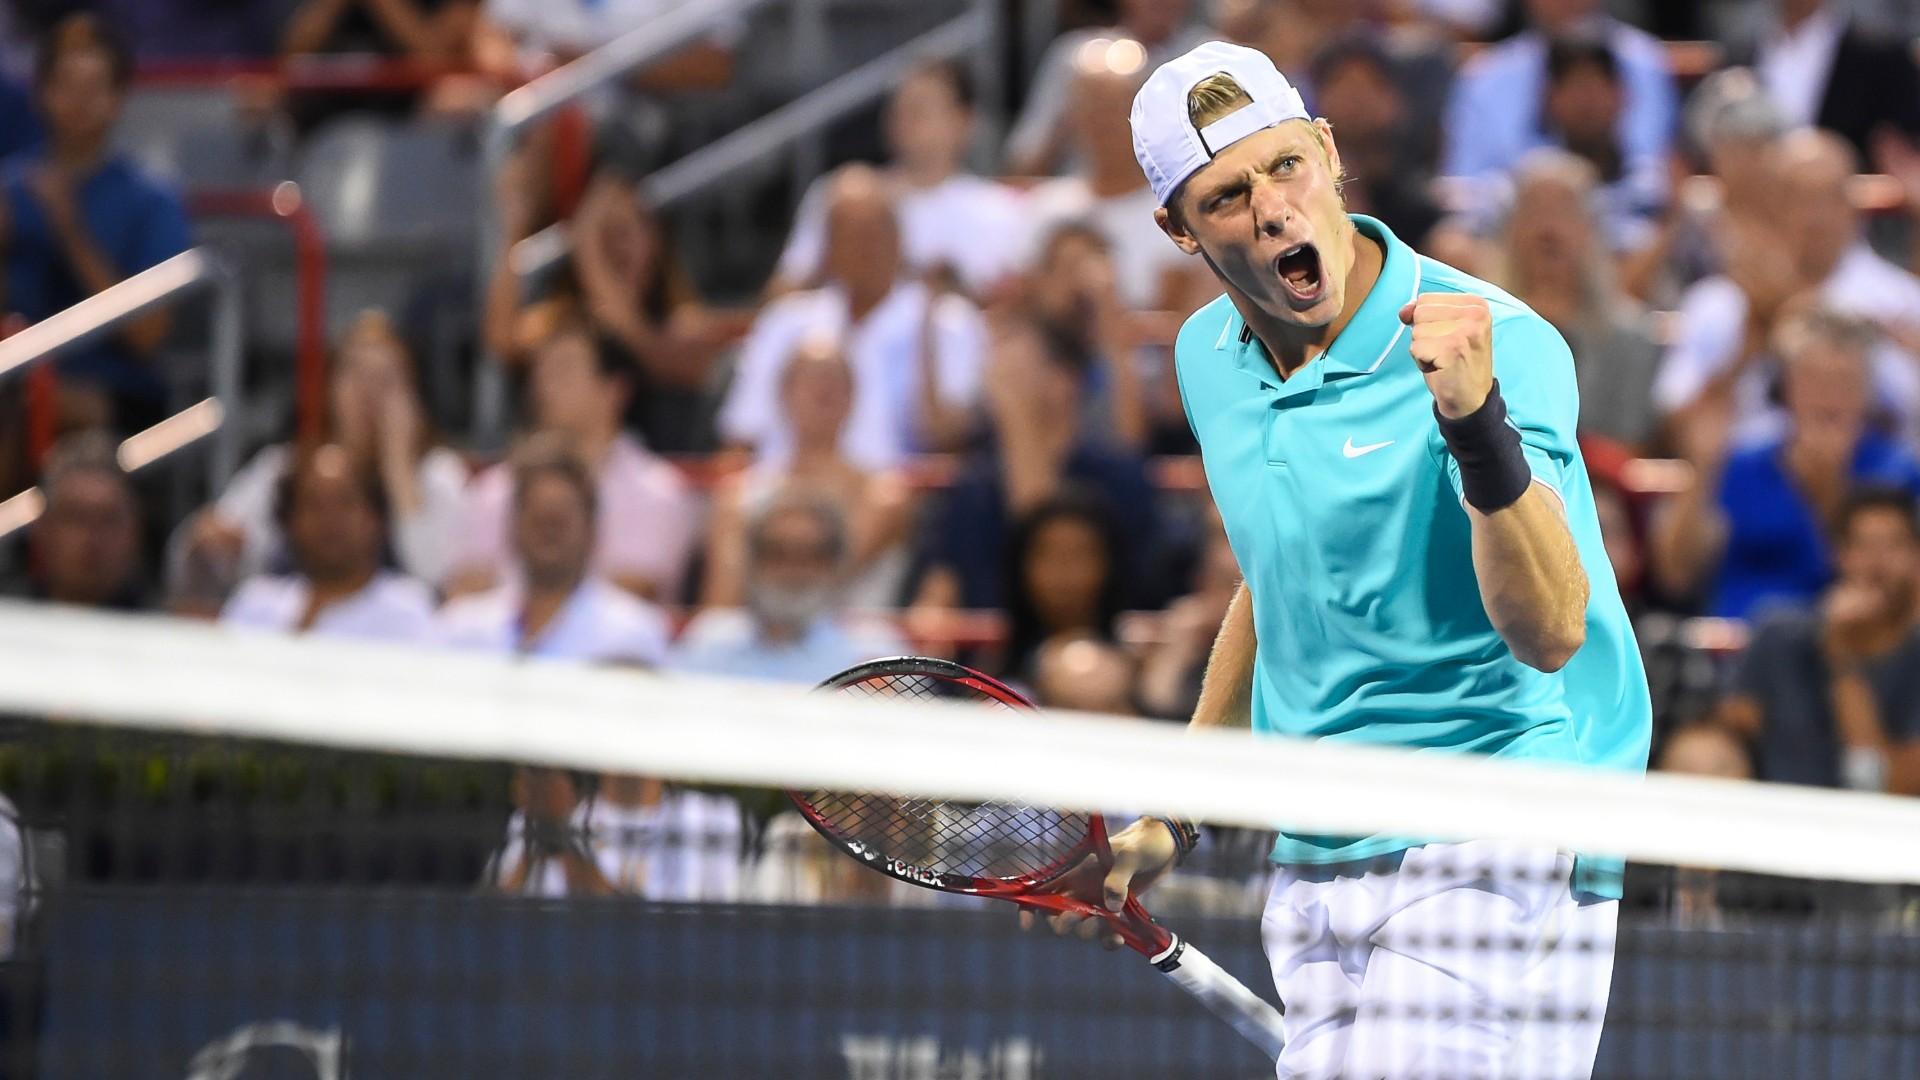 U.S. Open 2019: Denis Shapovalov has momentum heading into rematch with fellow Canadian Felix Auger-Aliassime